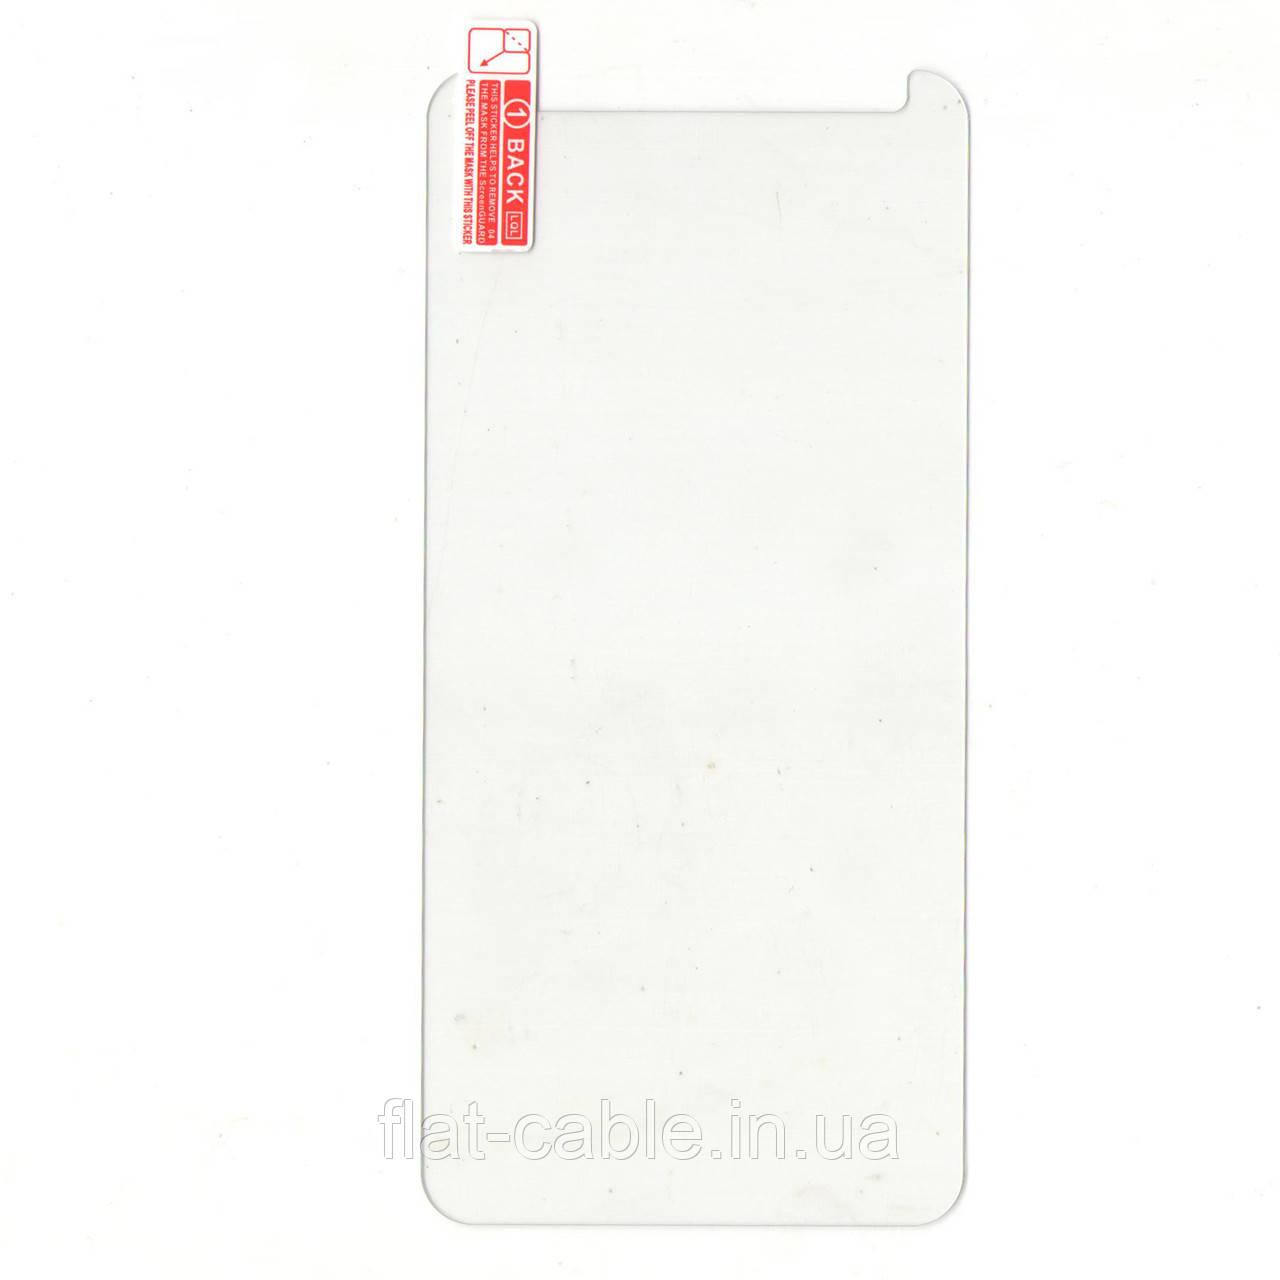 Защитное стекло для Meizu M6T (тех.пак)